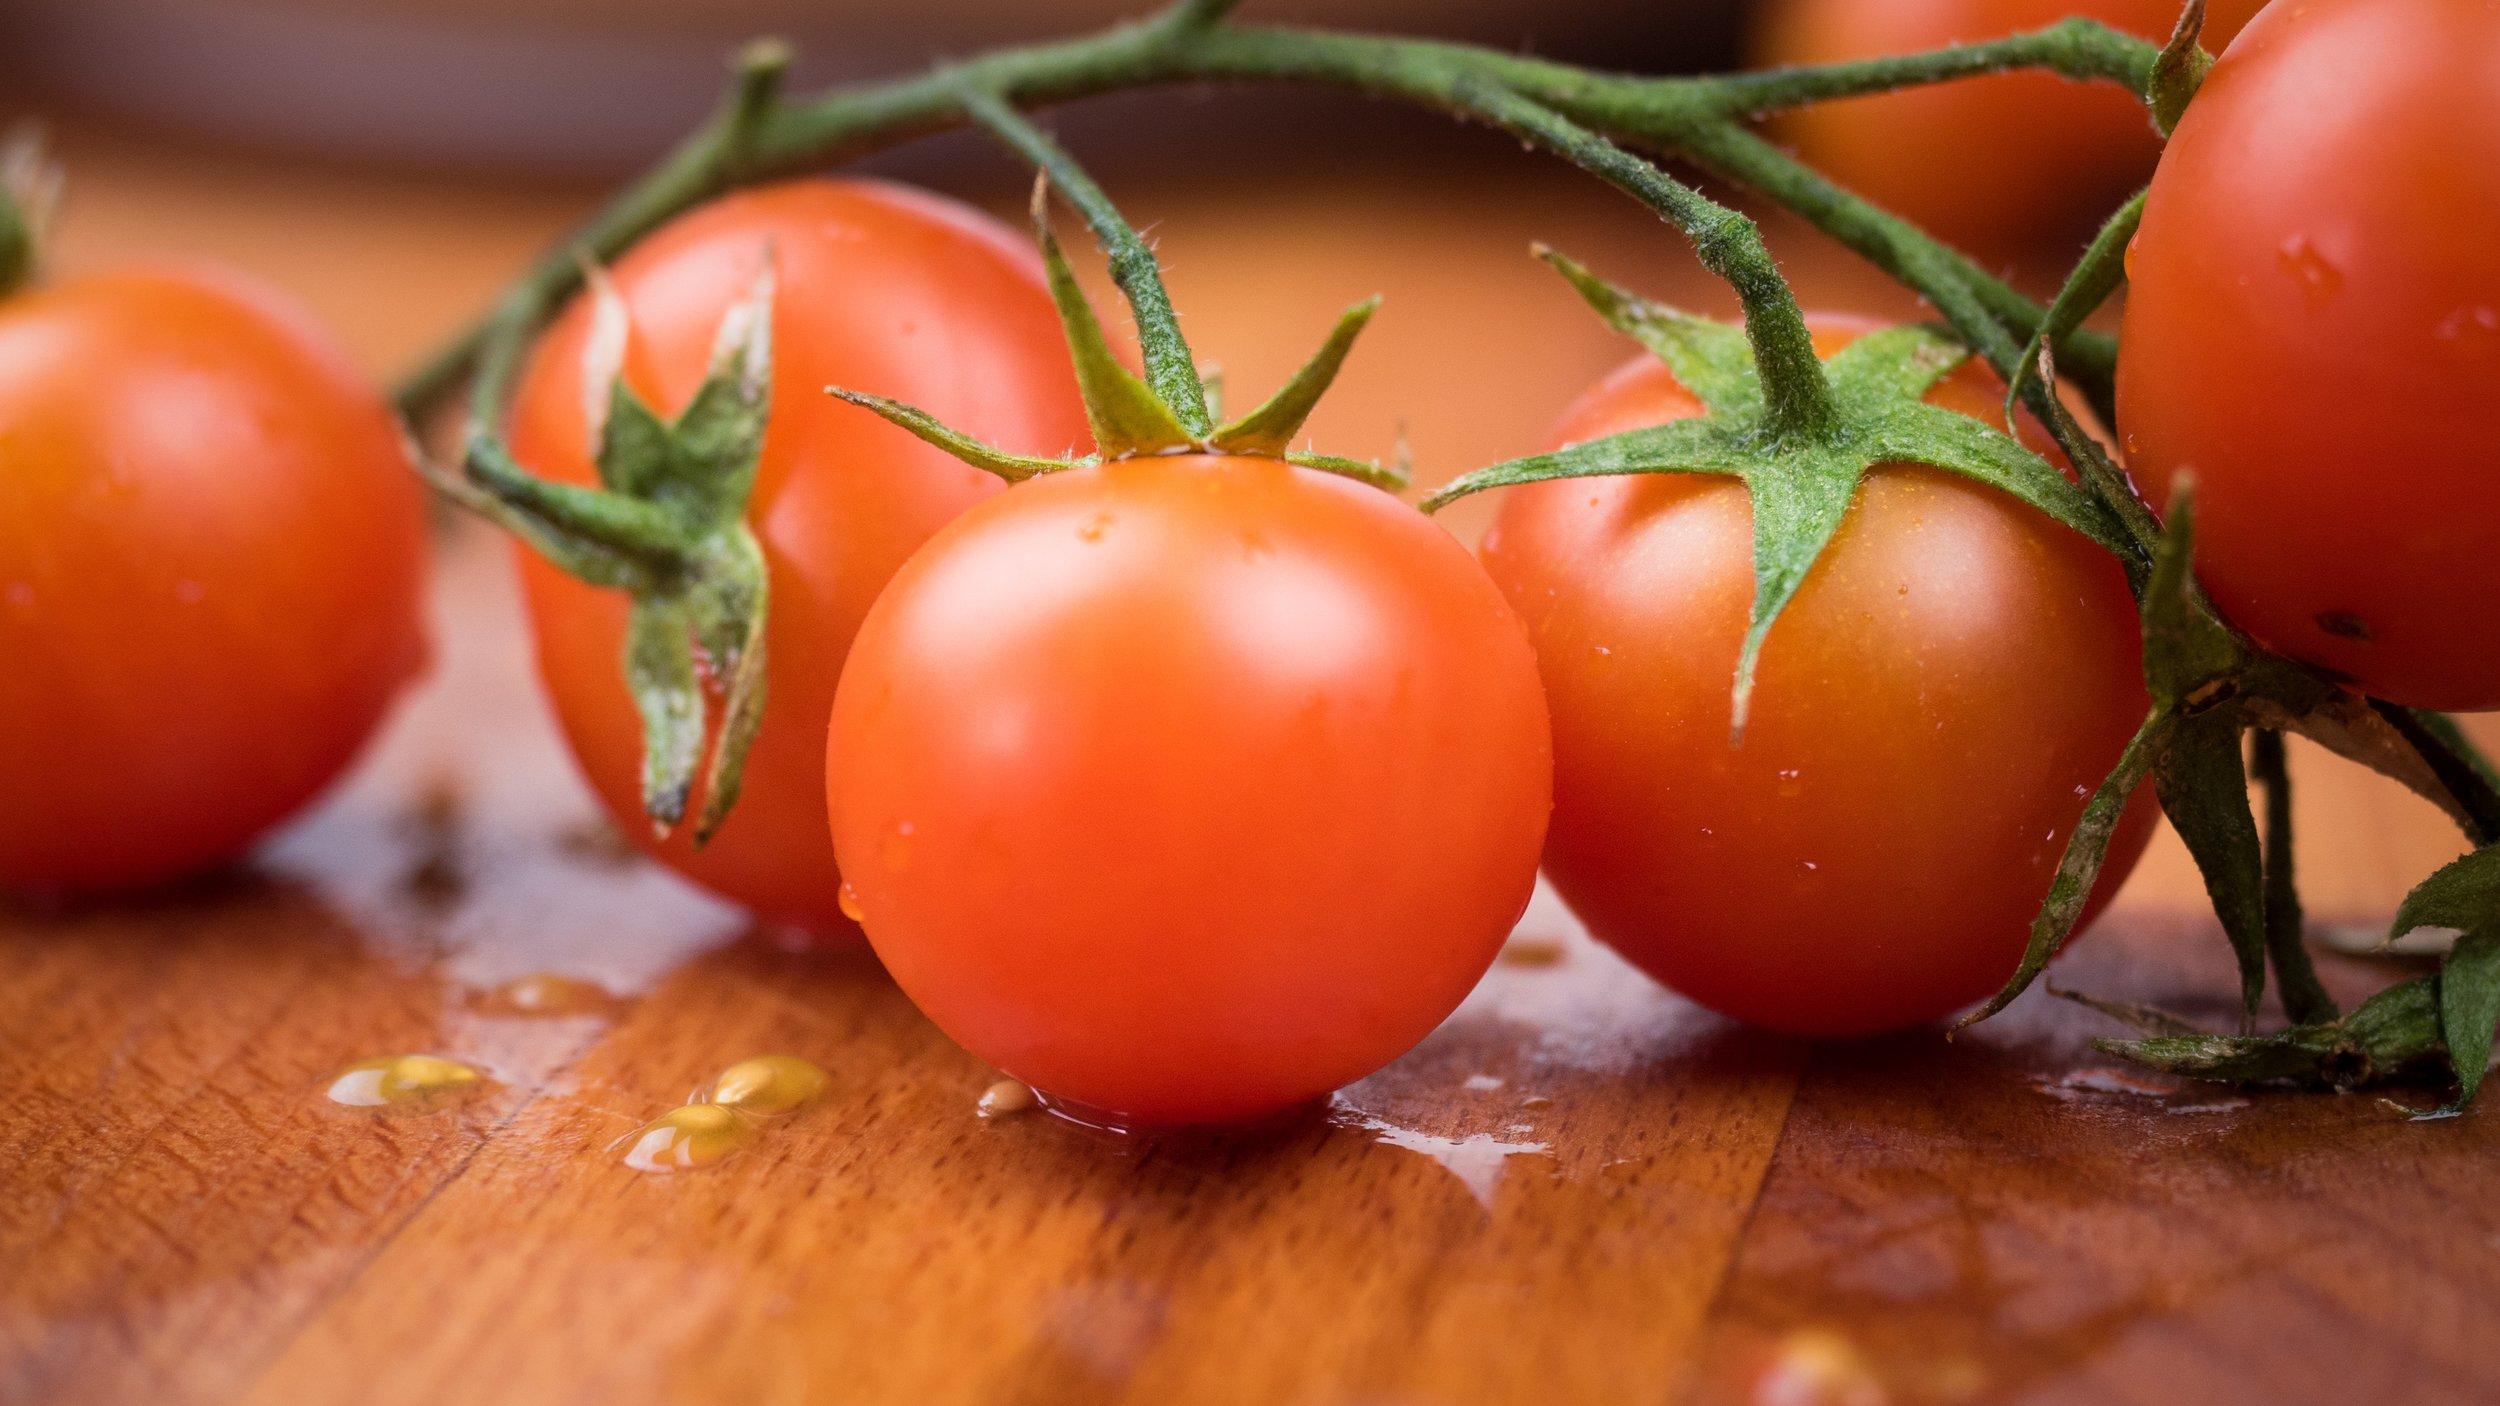 10. Tomatoes -